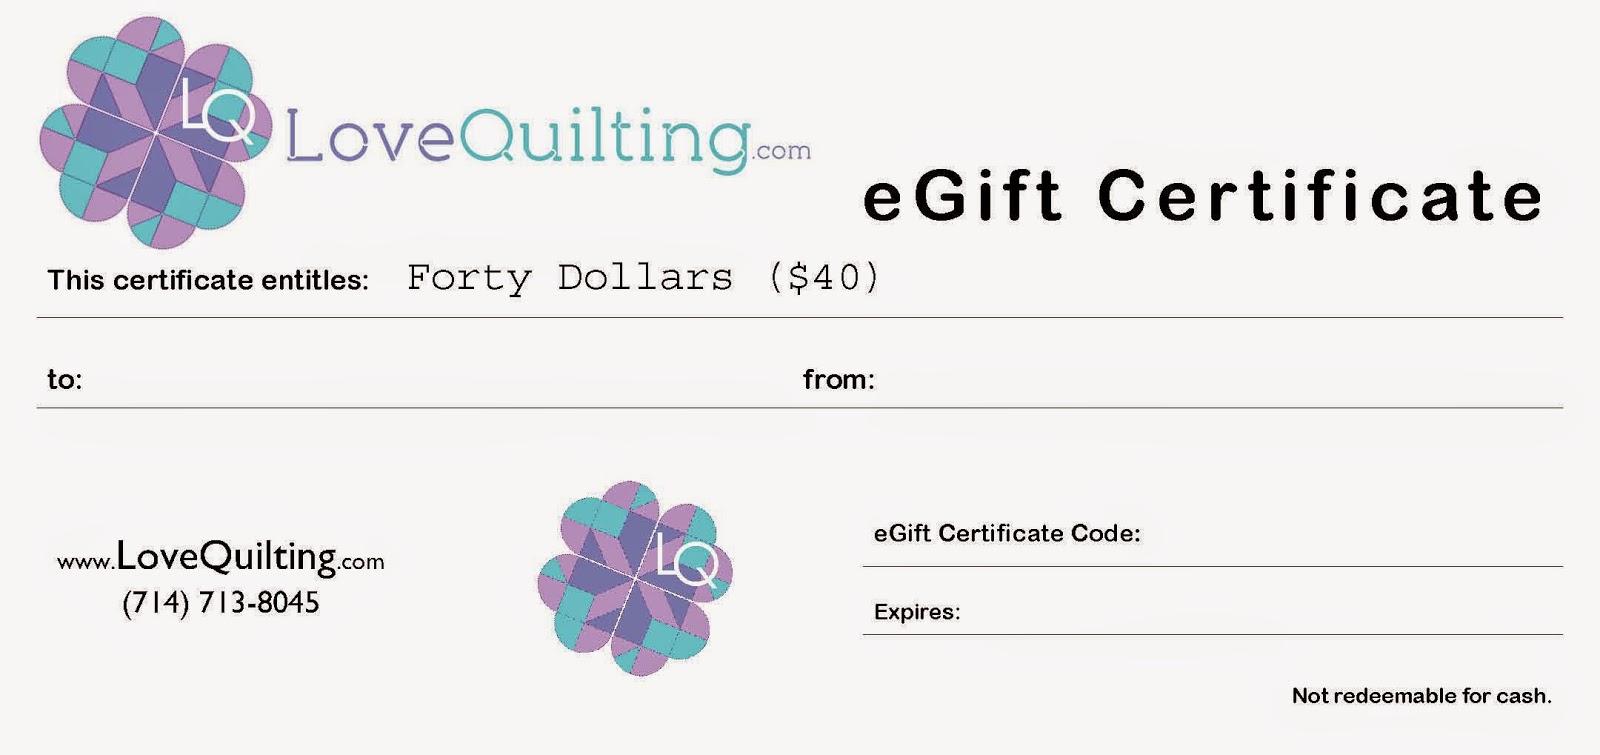 http://www.lovequilting.com/shop/accessories/40-egift-certificate/